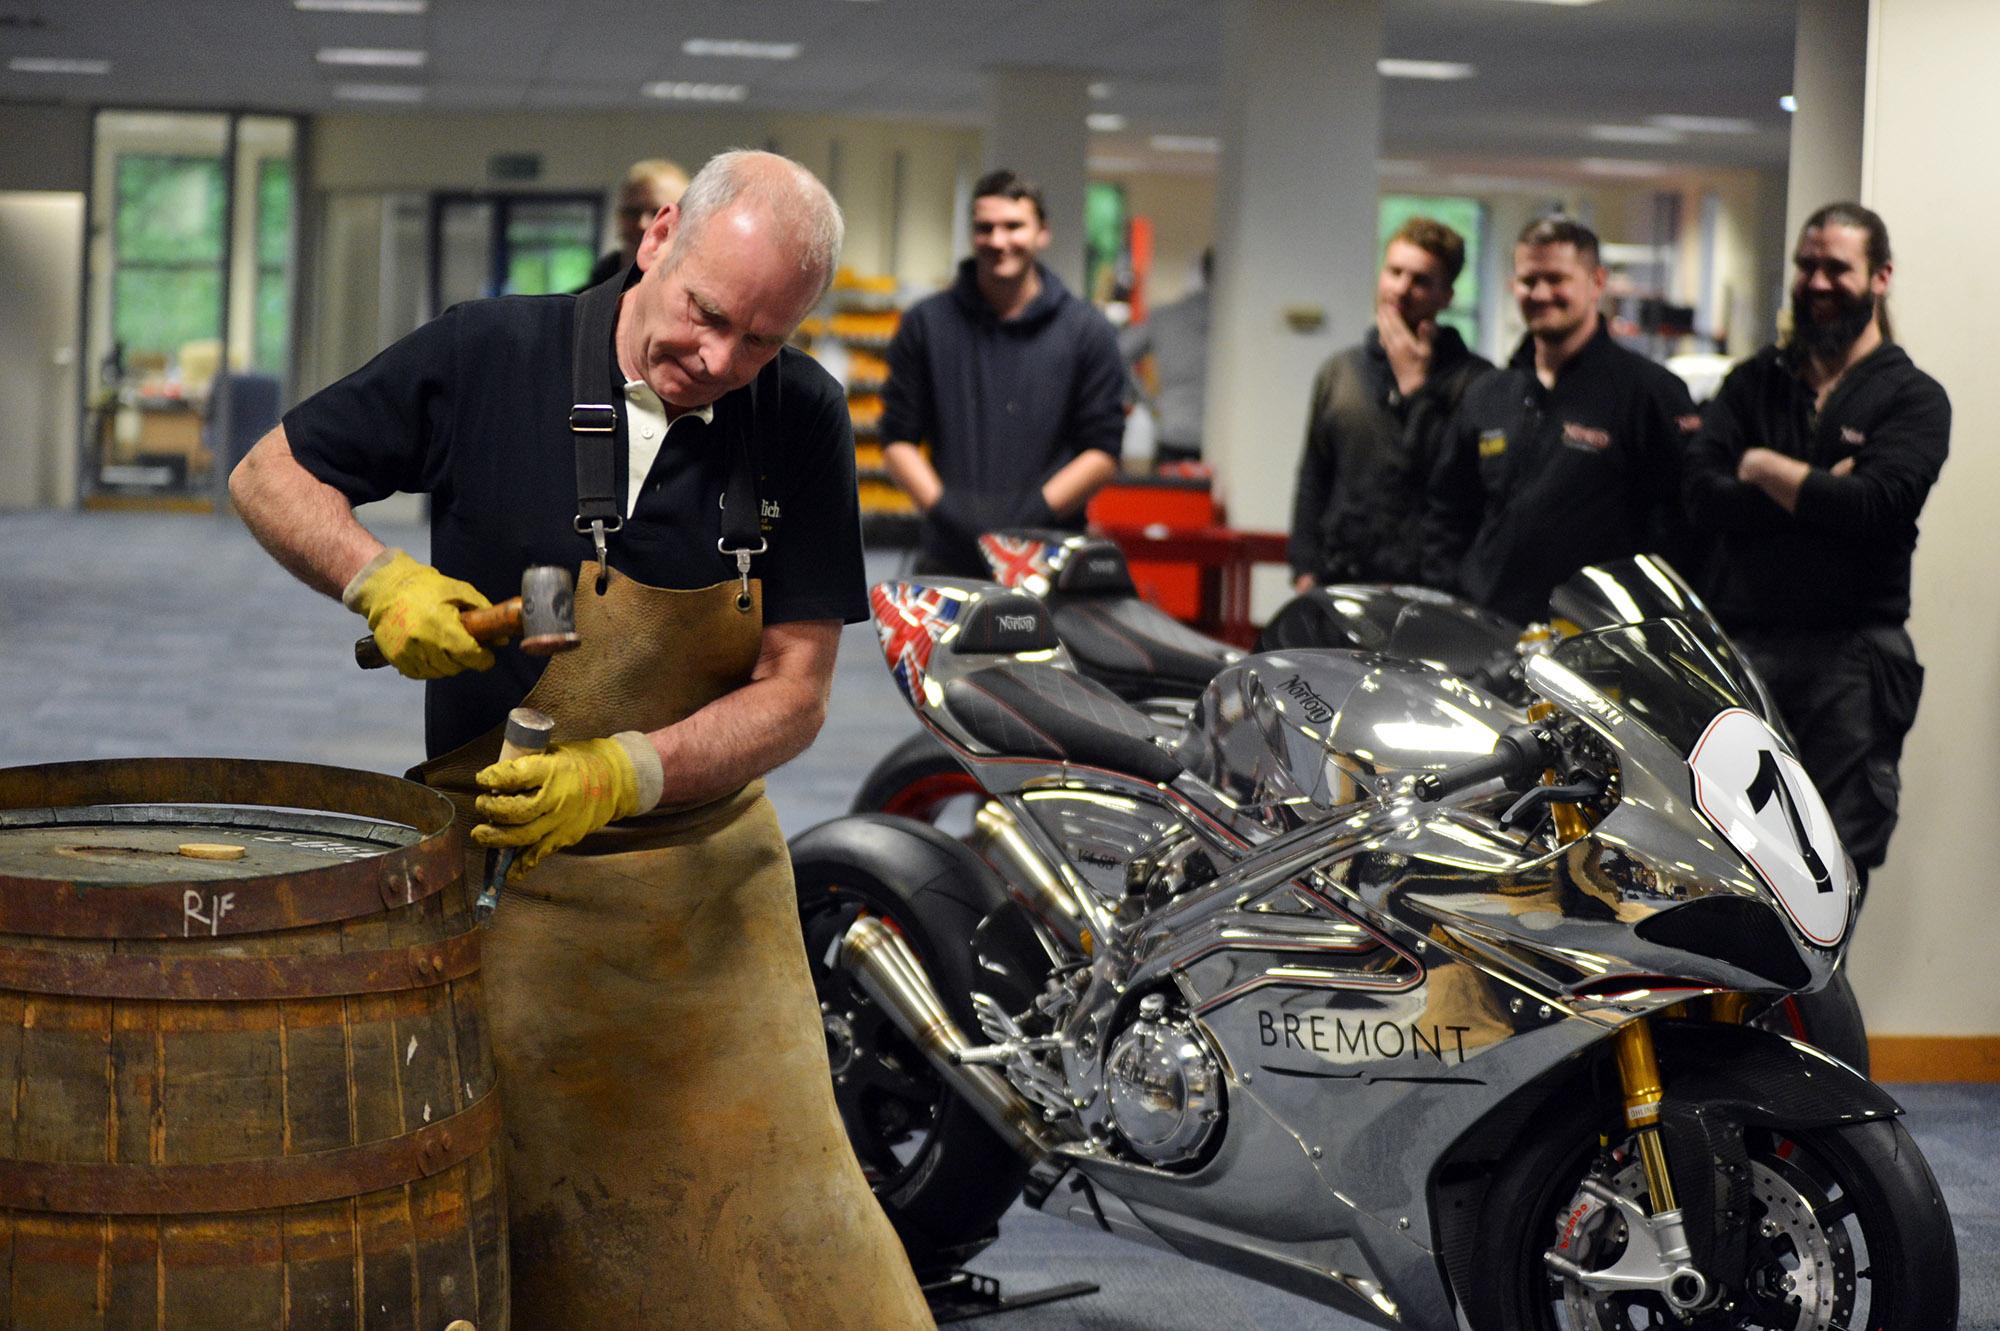 Ian McDonald demonstrates raising a cask